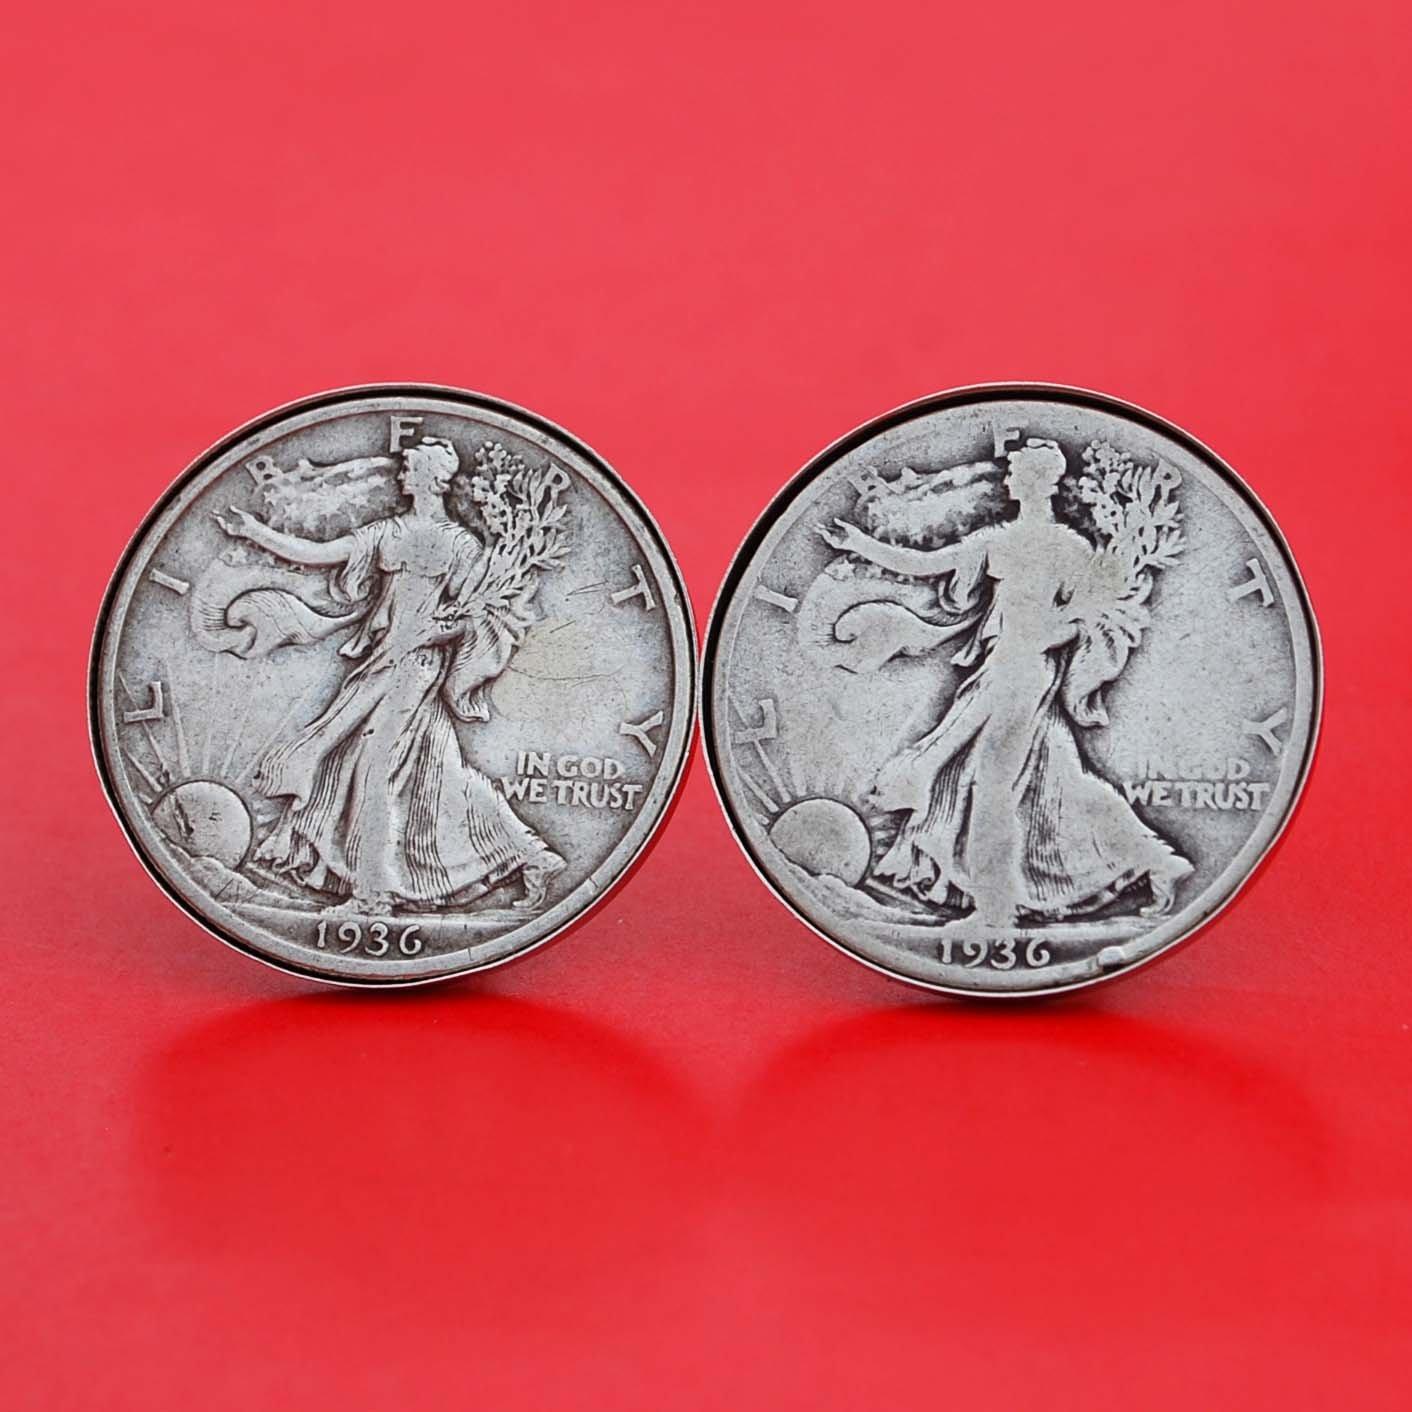 US 1936 Walking Liberty Save money Half Silver Dollar Max 58% OFF Cuffl 90% Coin